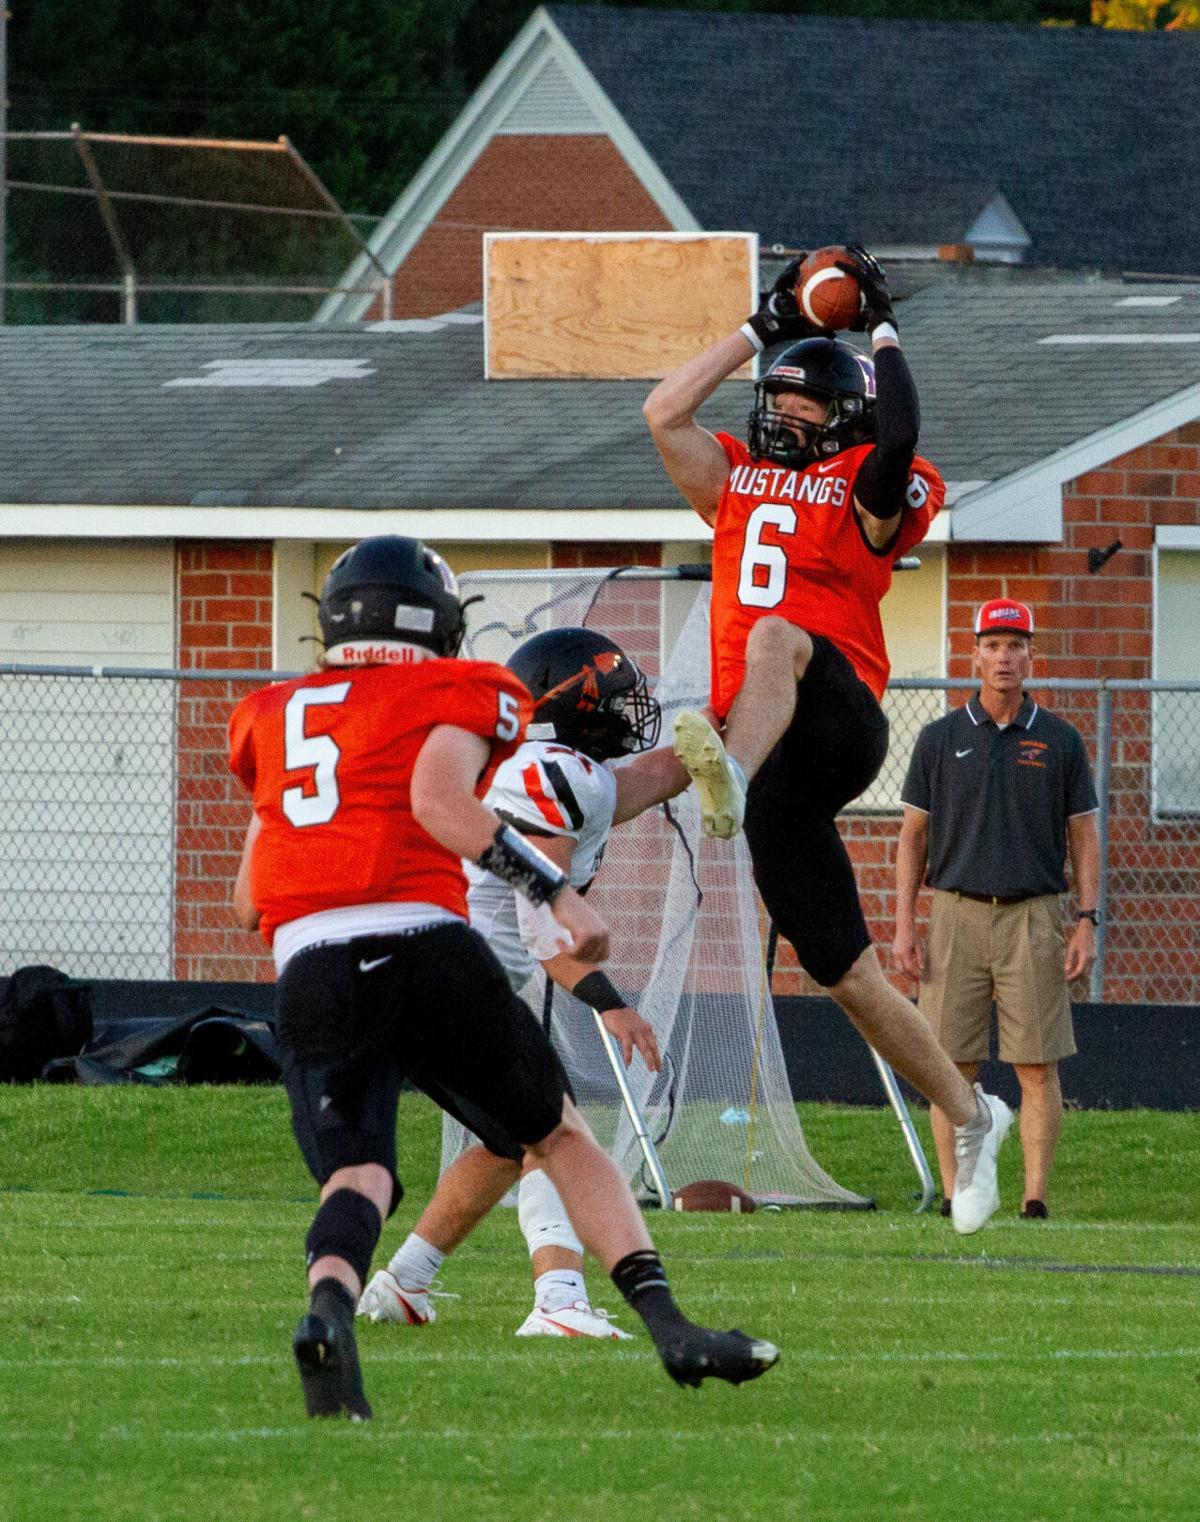 Powhatan at Mechanicsville football: Bidou hauls one in